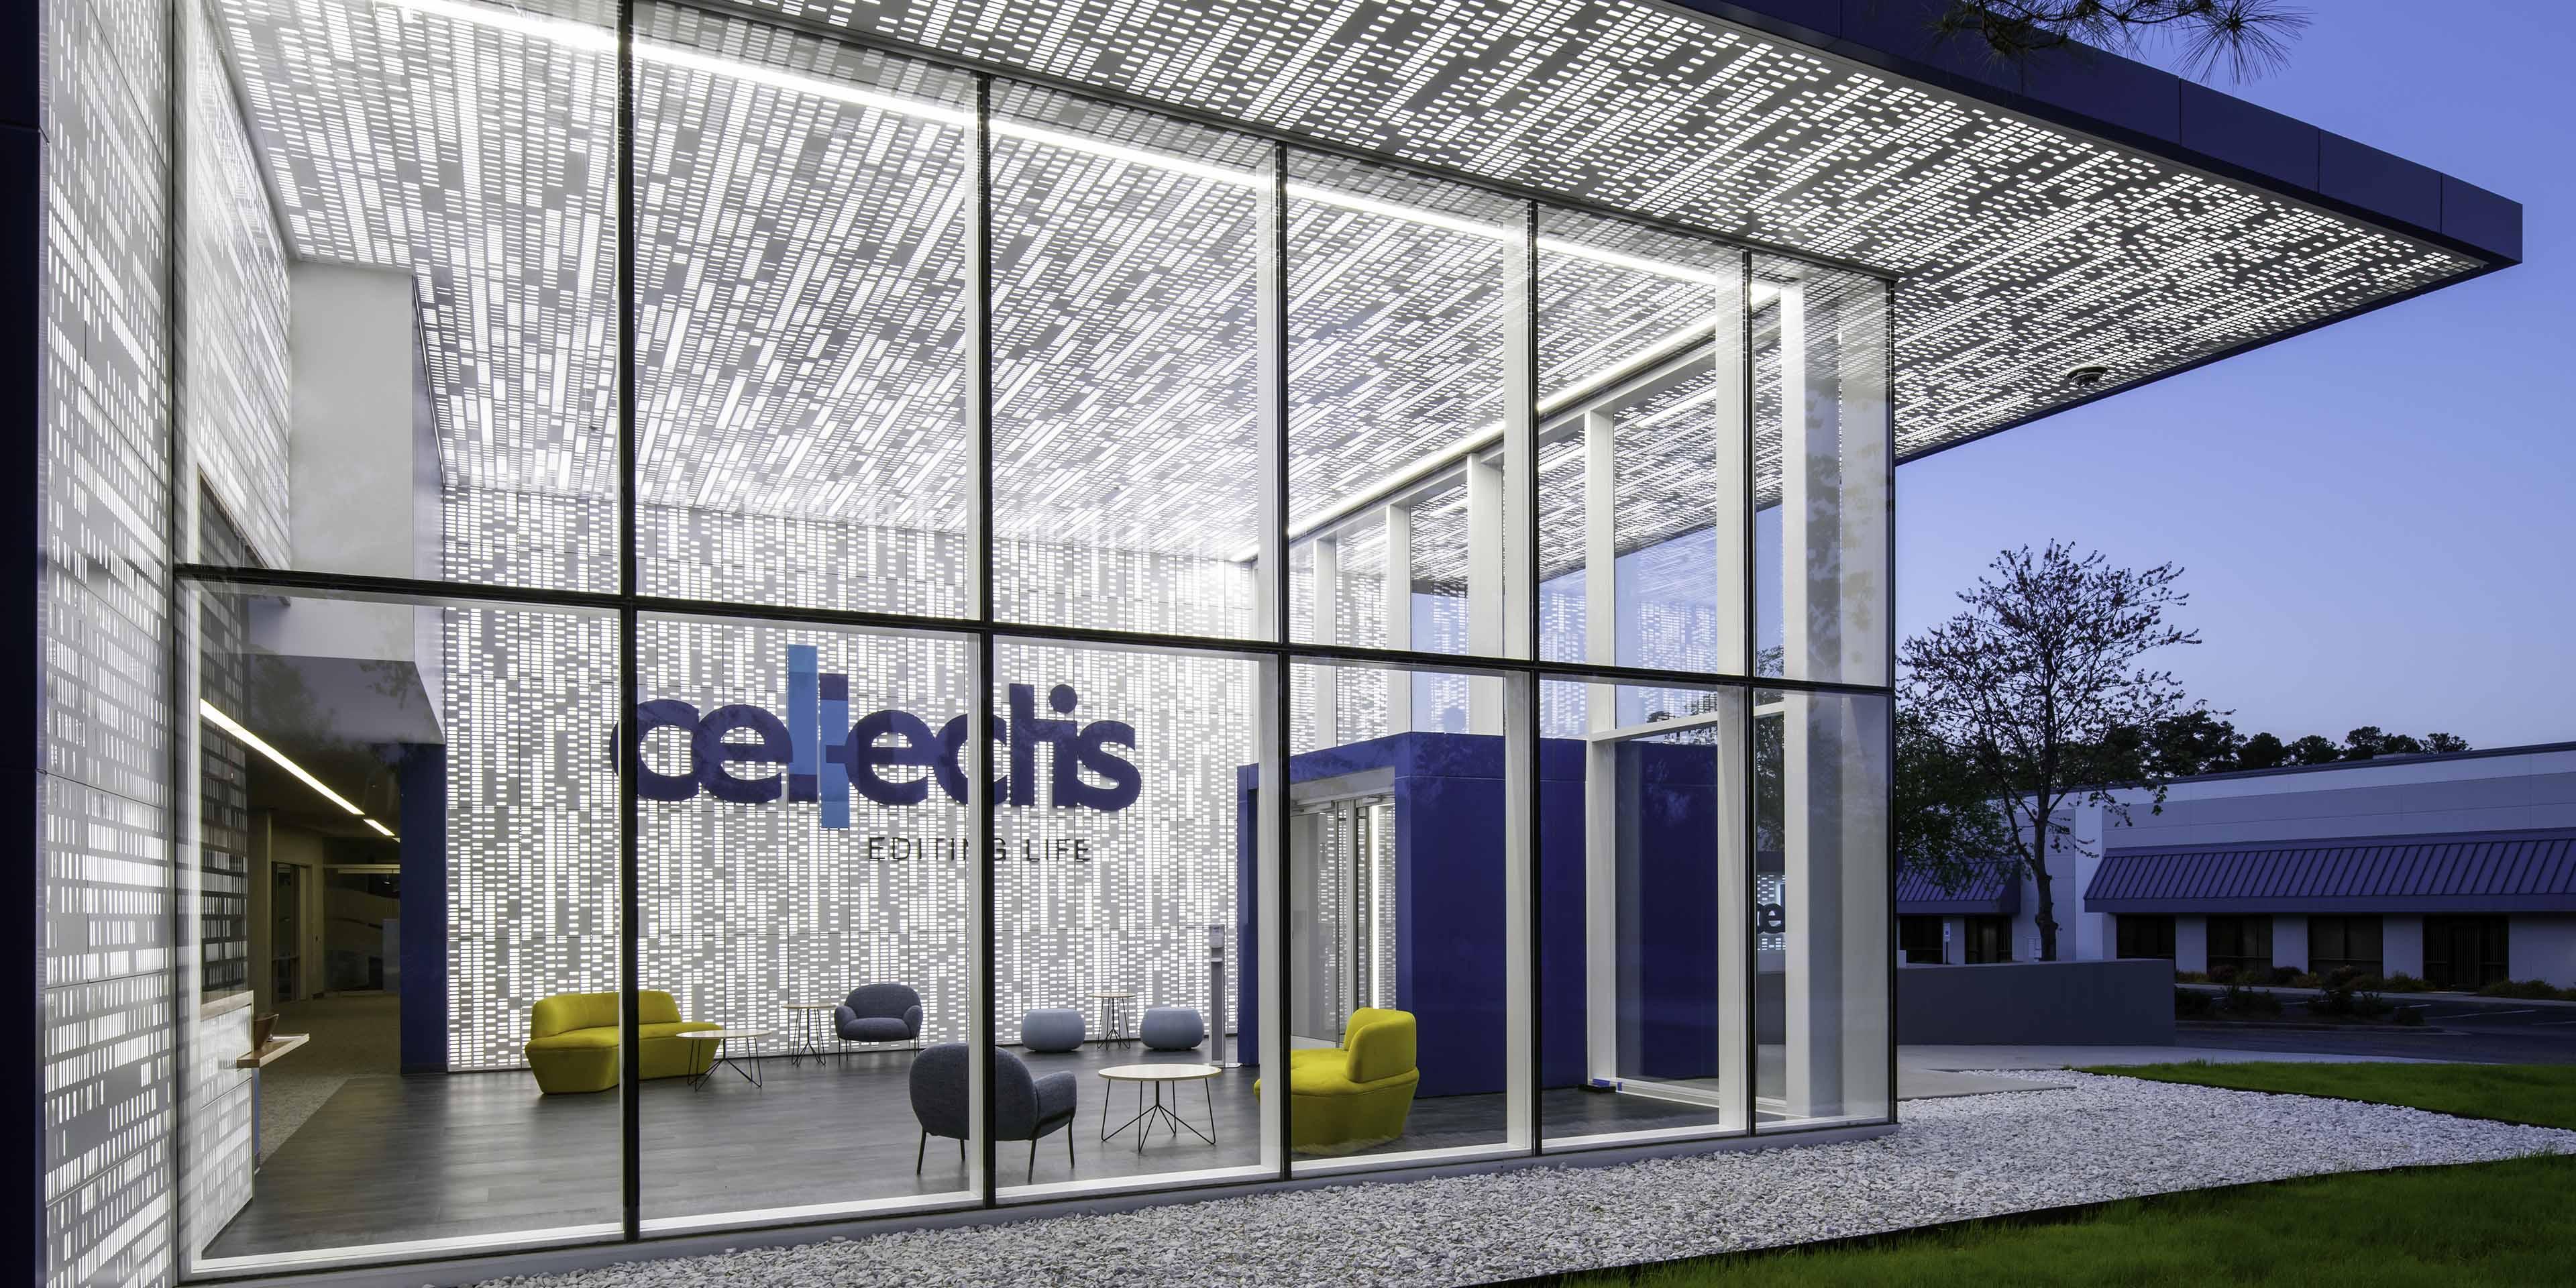 custom designed gene-editing wall at Cellectis